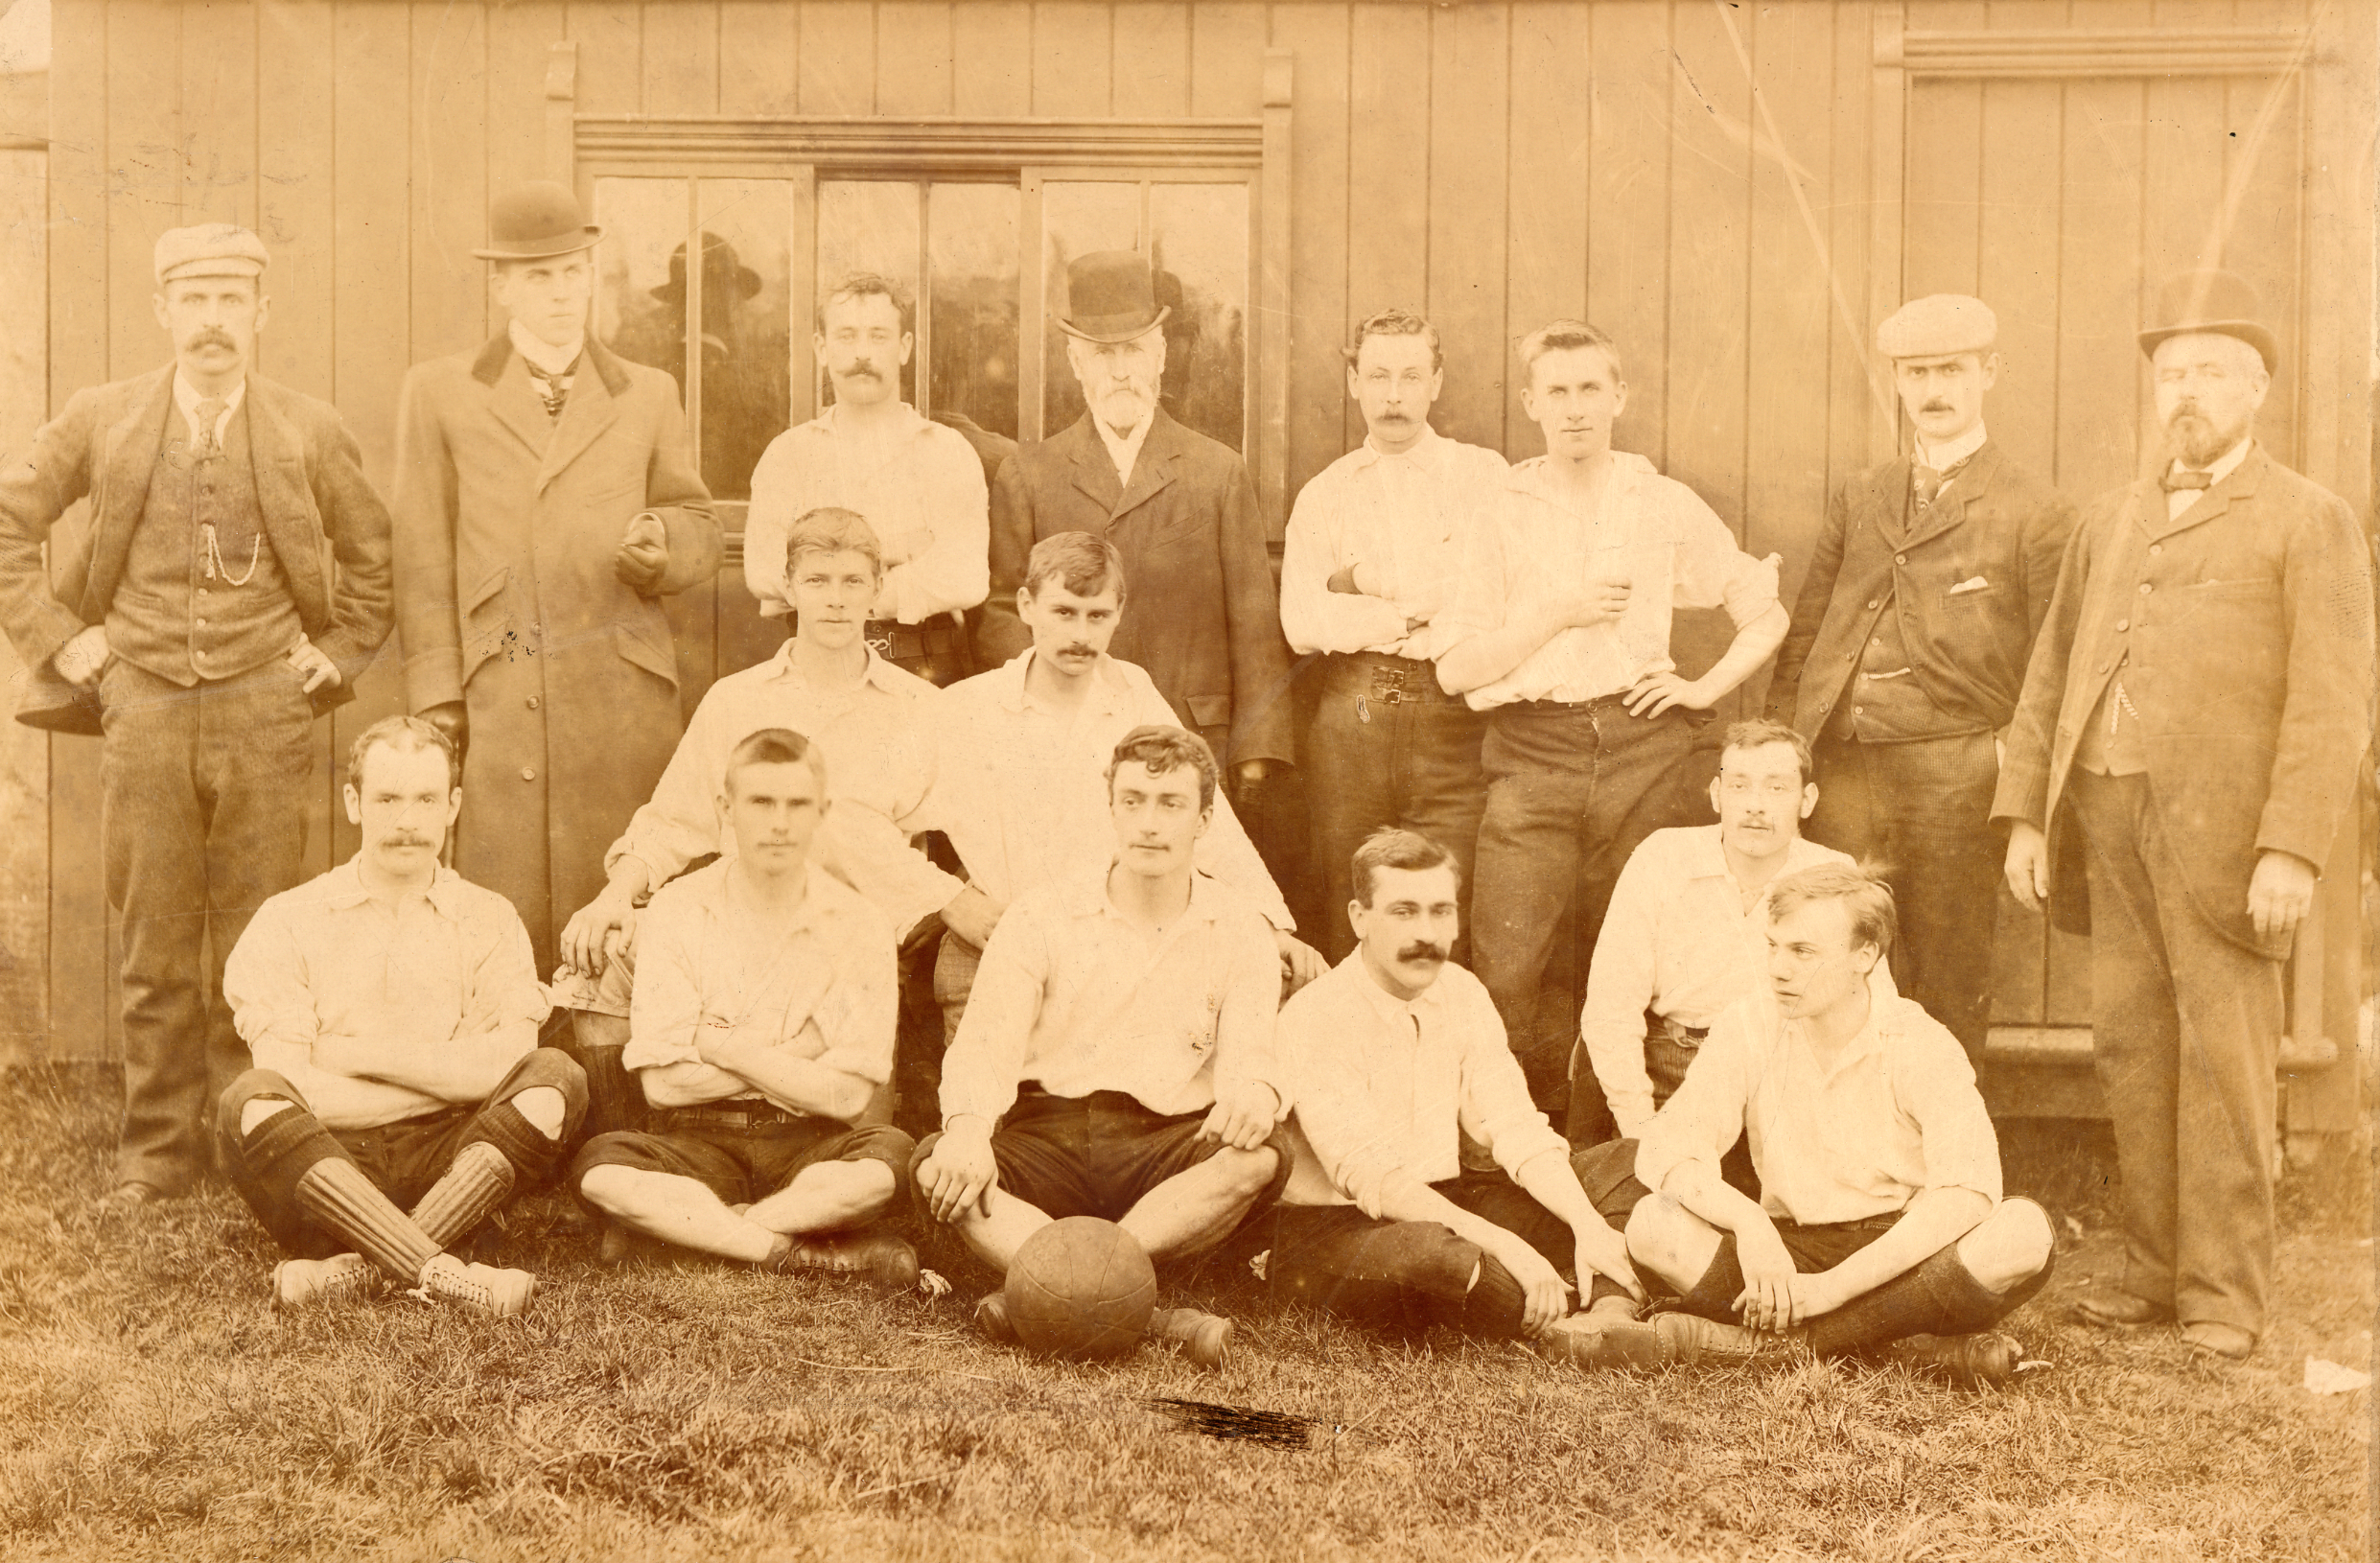 Unknown Team said to be around 1899